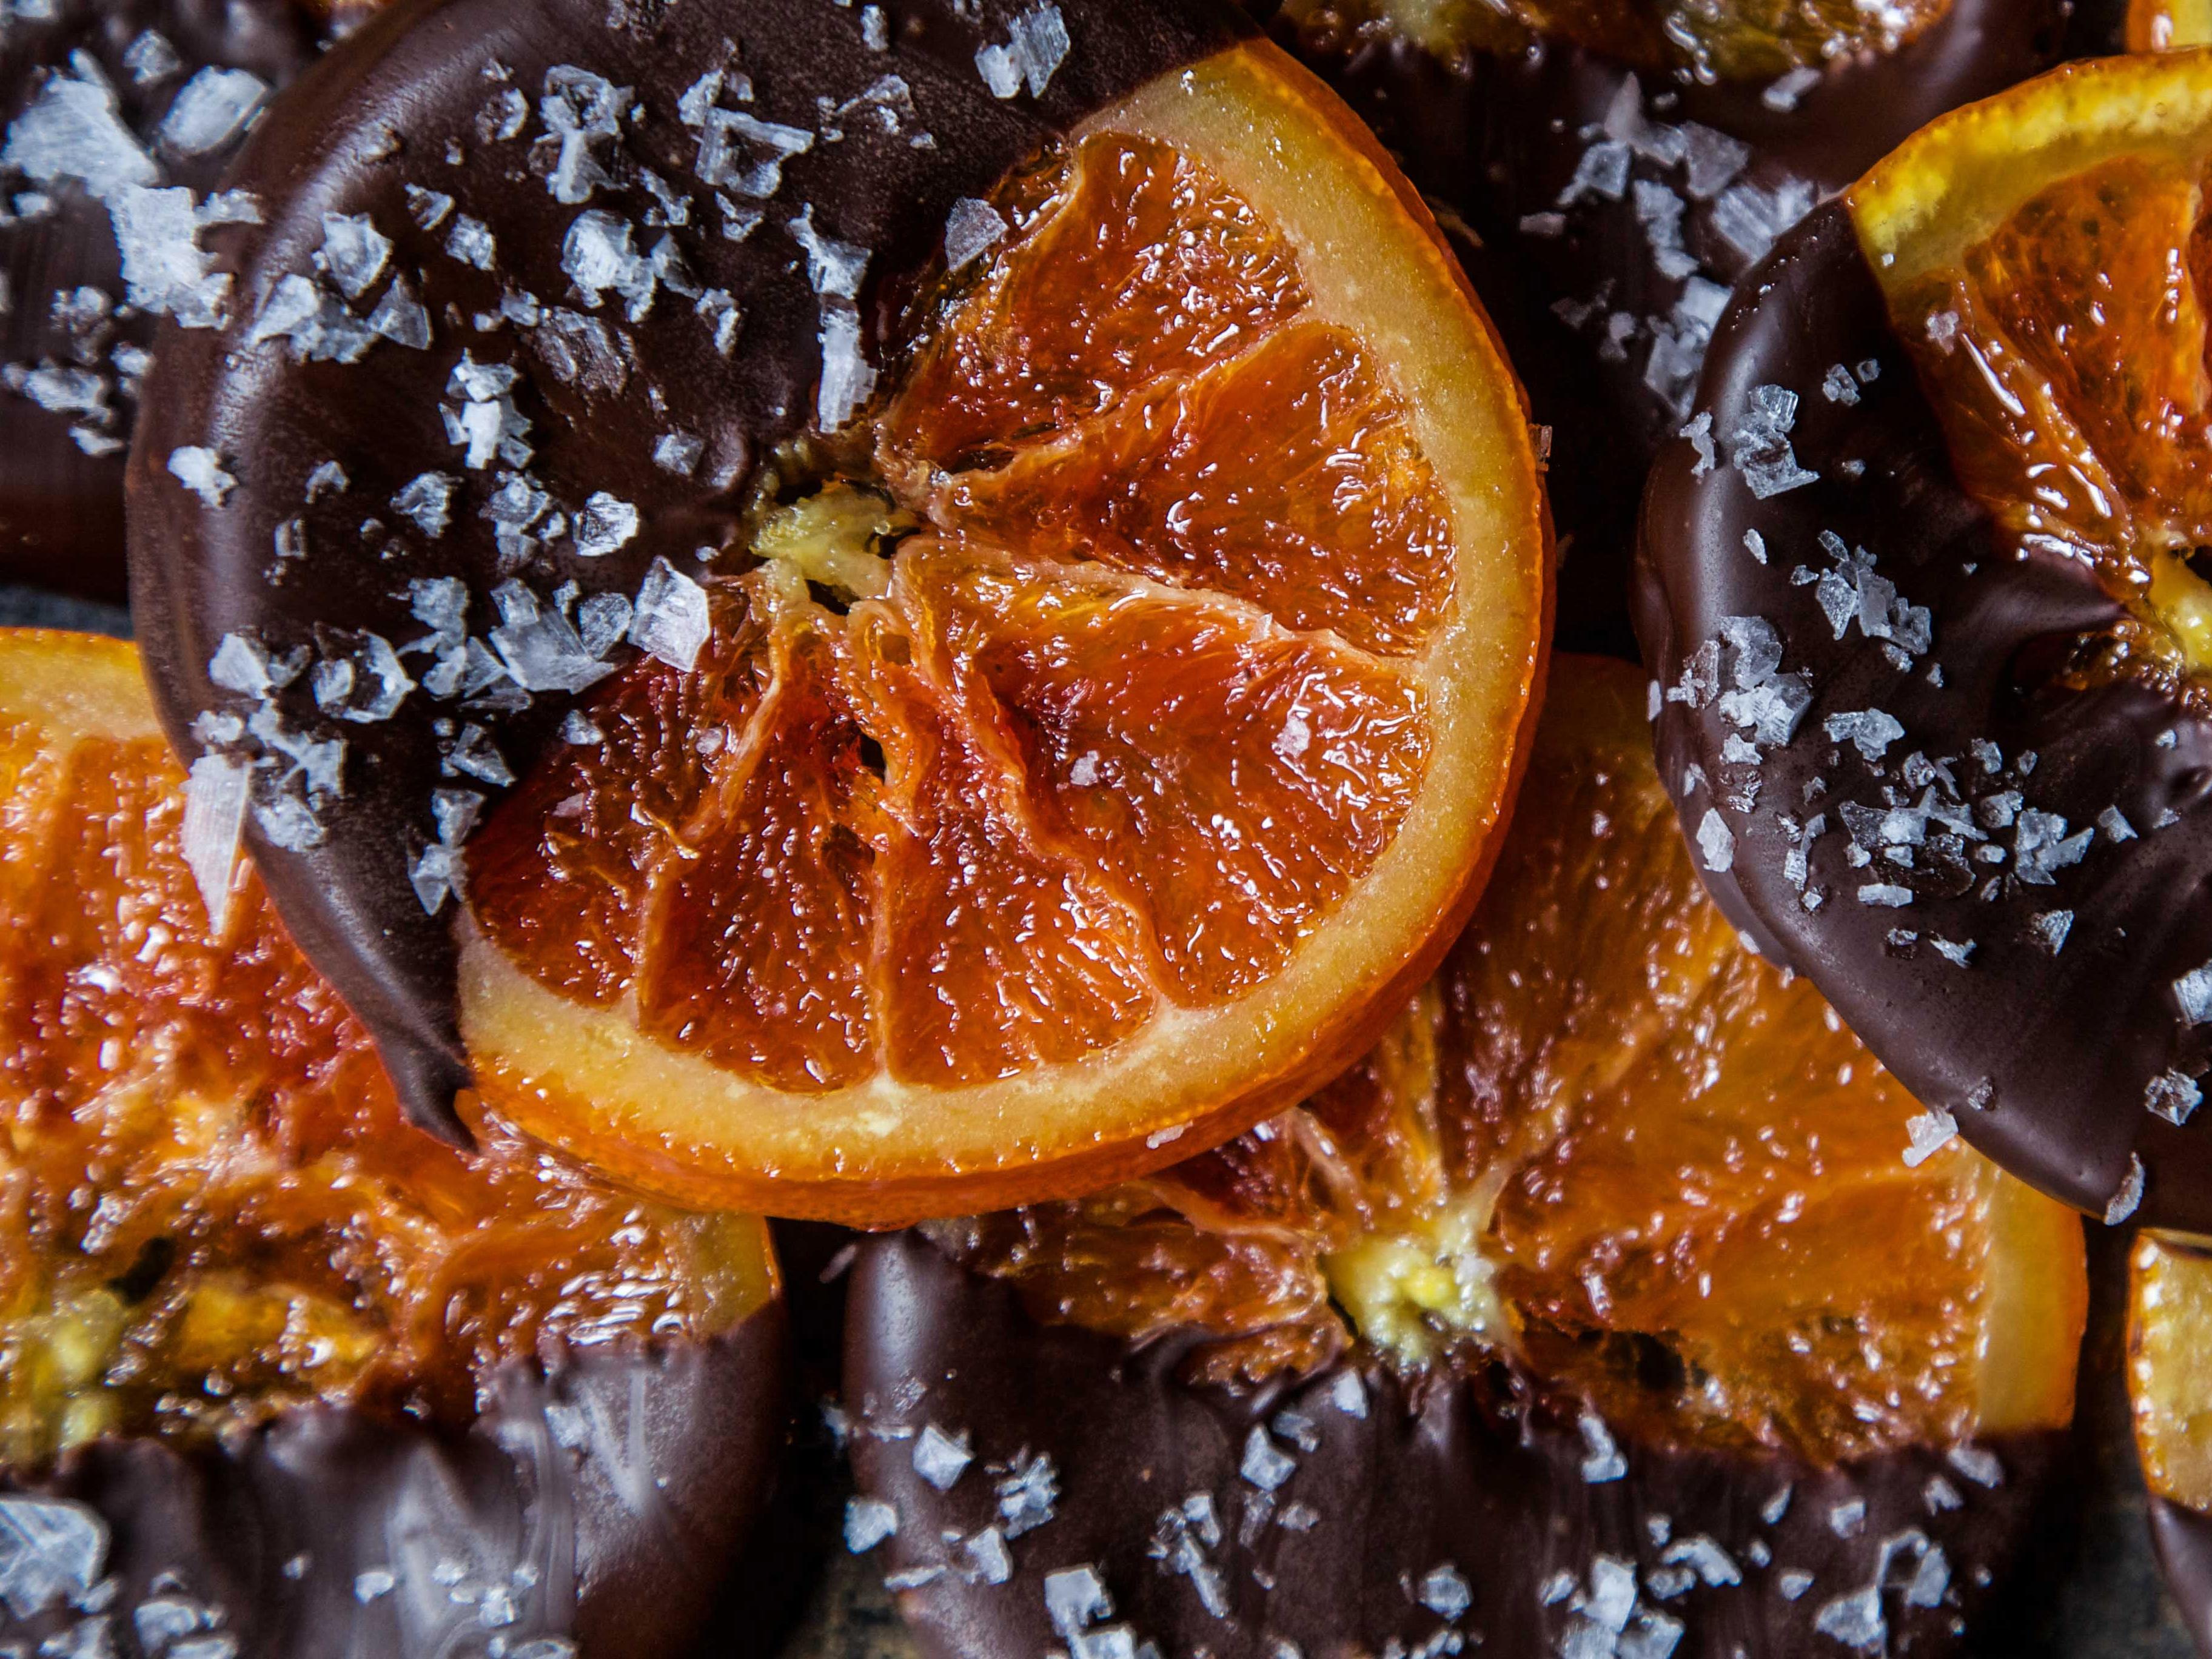 Candied Orange Slices with Dark Chocolate